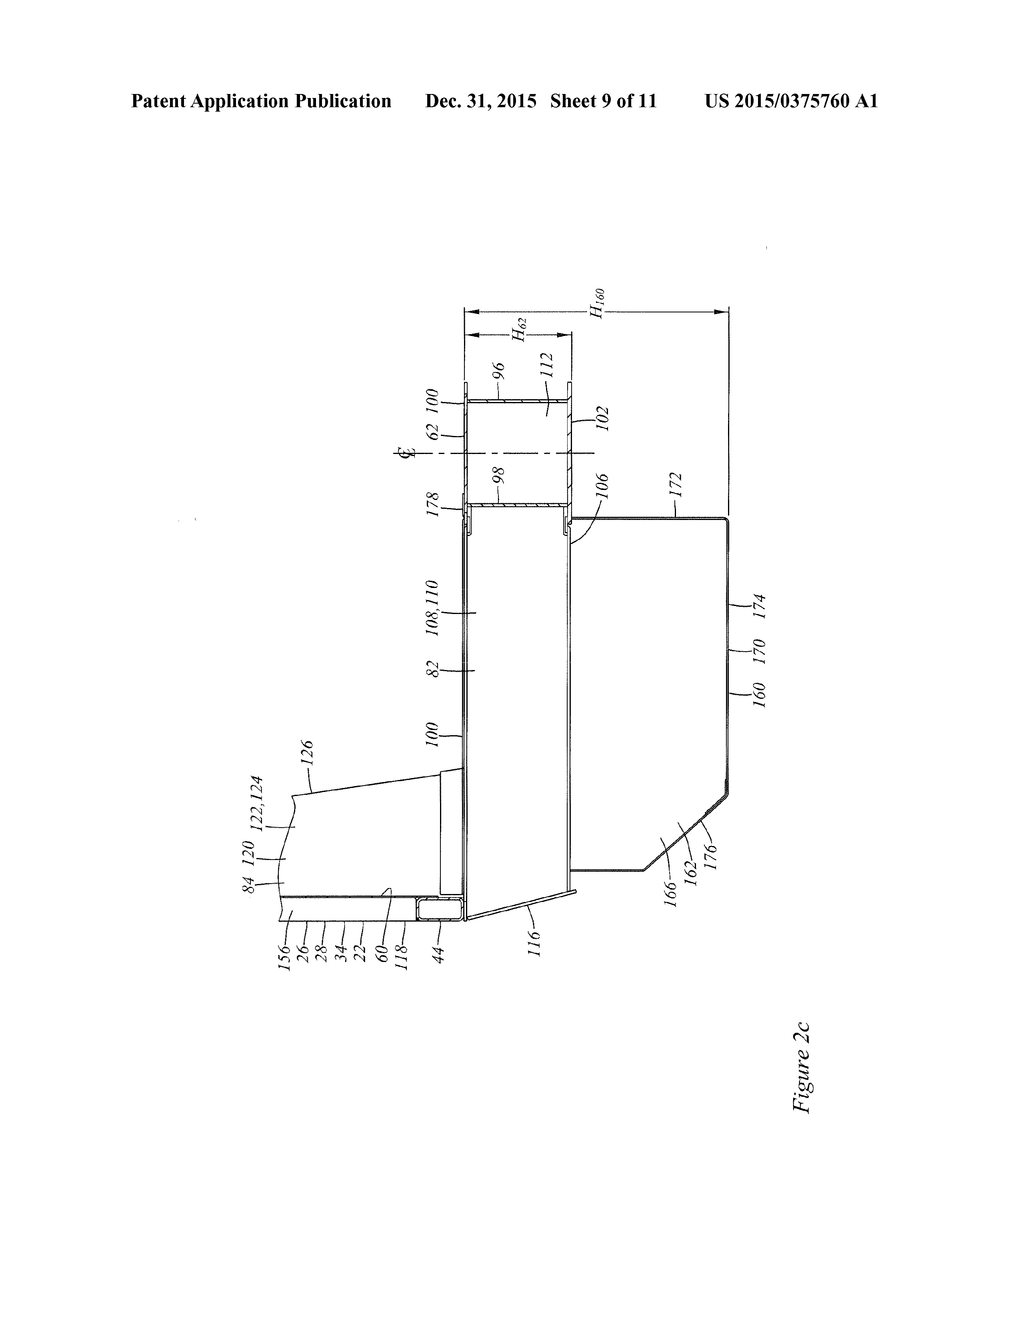 railroad gondola car structure diagram schematic and image 10 rh patentsencyclopedia com